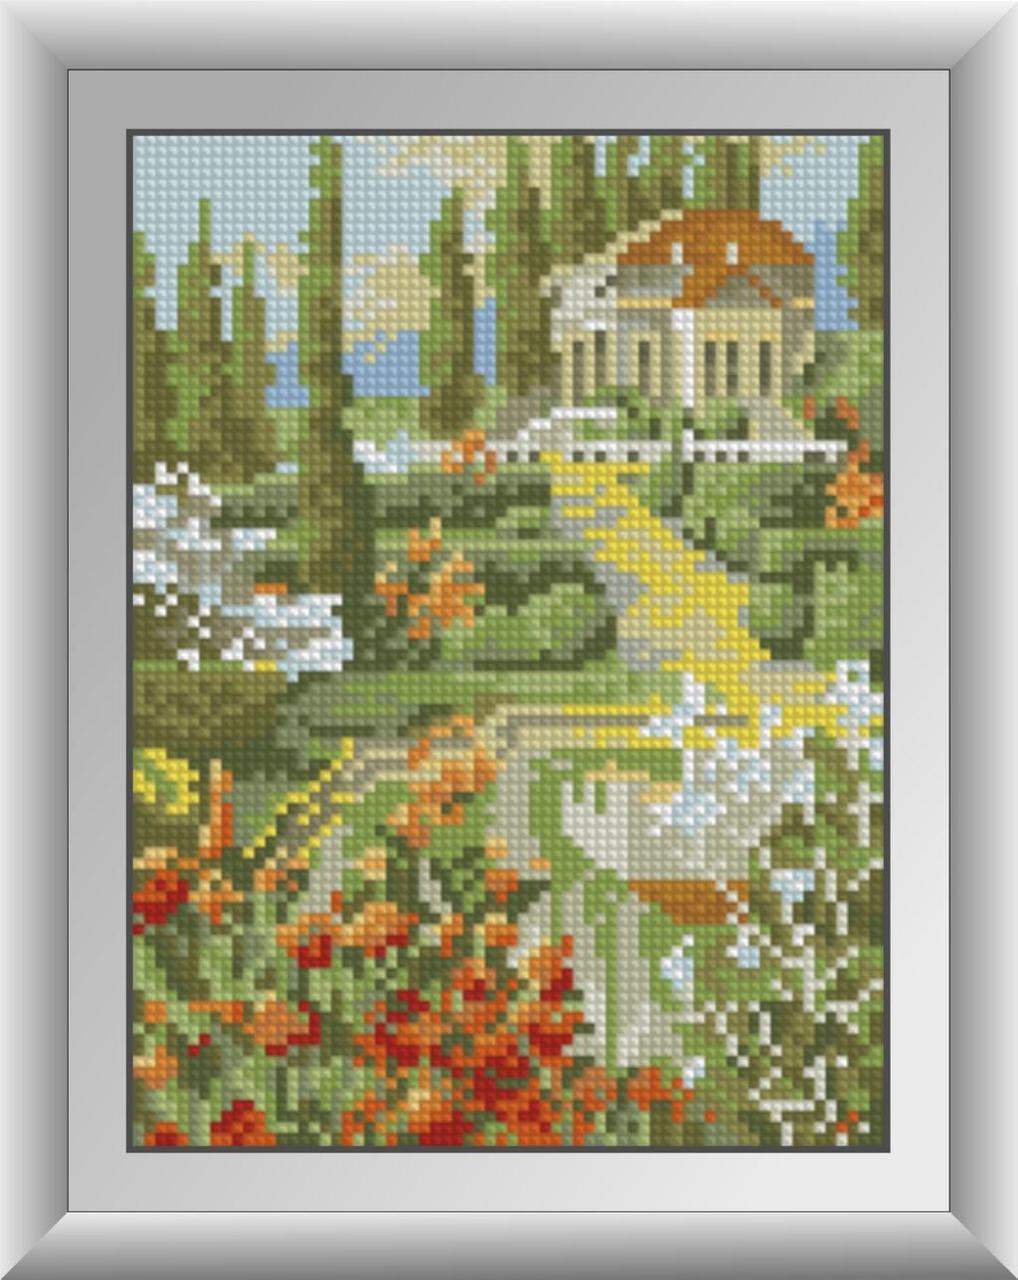 30549 Набір алмазної мозаїки Літня казка